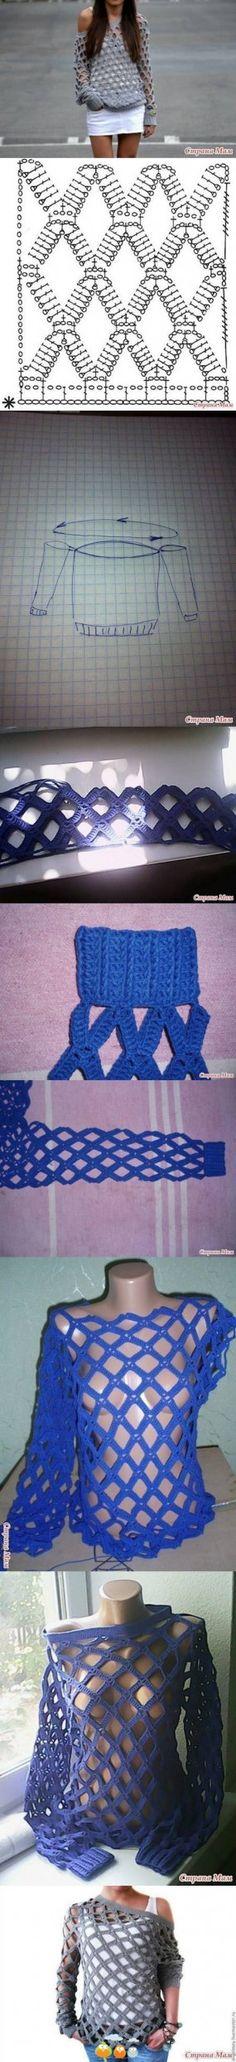 crochet maglietta m/lunga